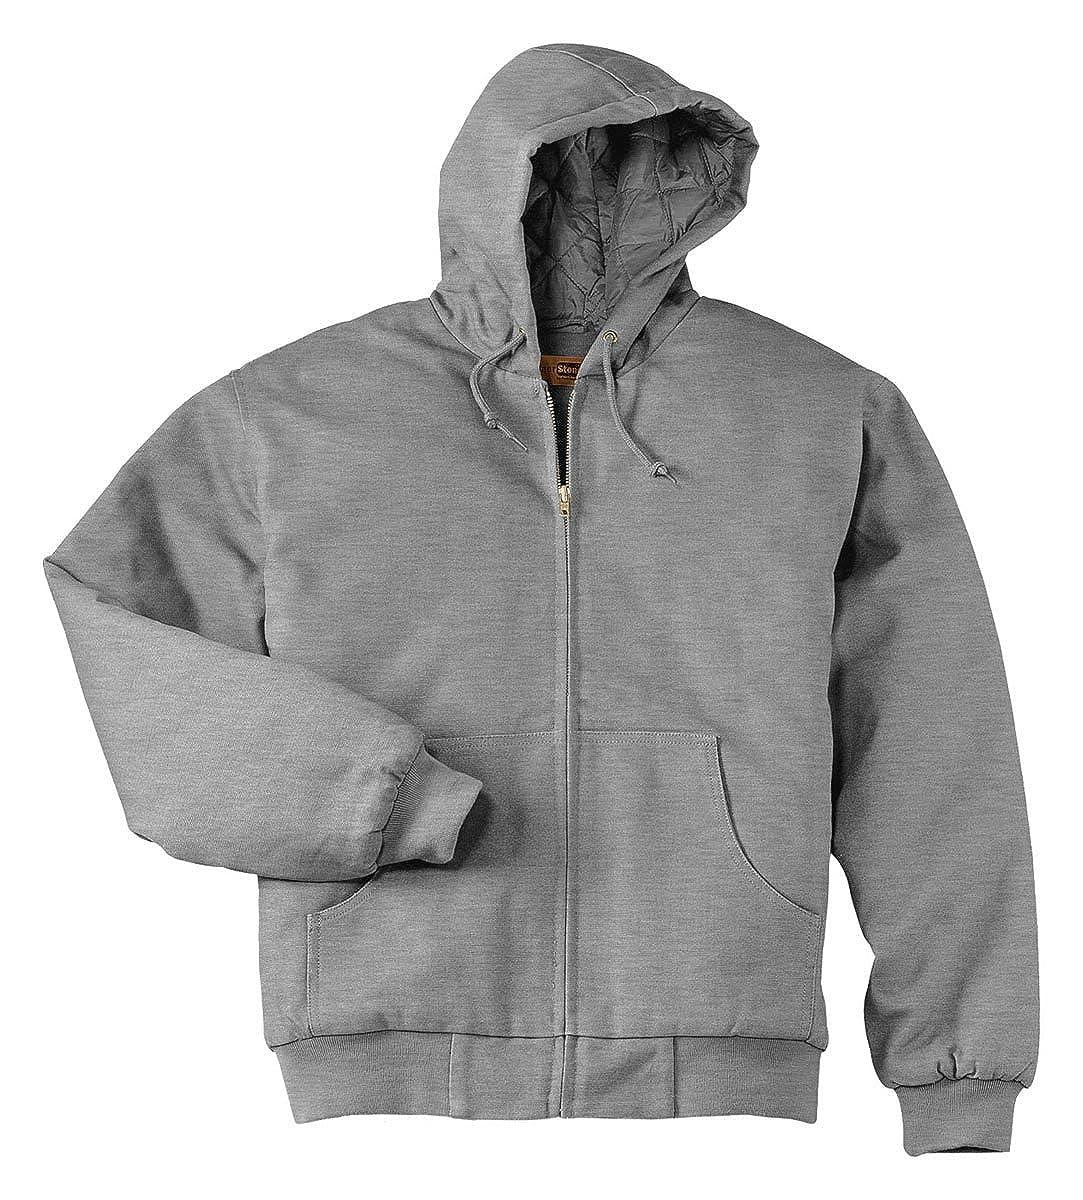 Cornerstone Mens Heavyweight Full-Zip Hooded Sweatshirt with Thermal Lining